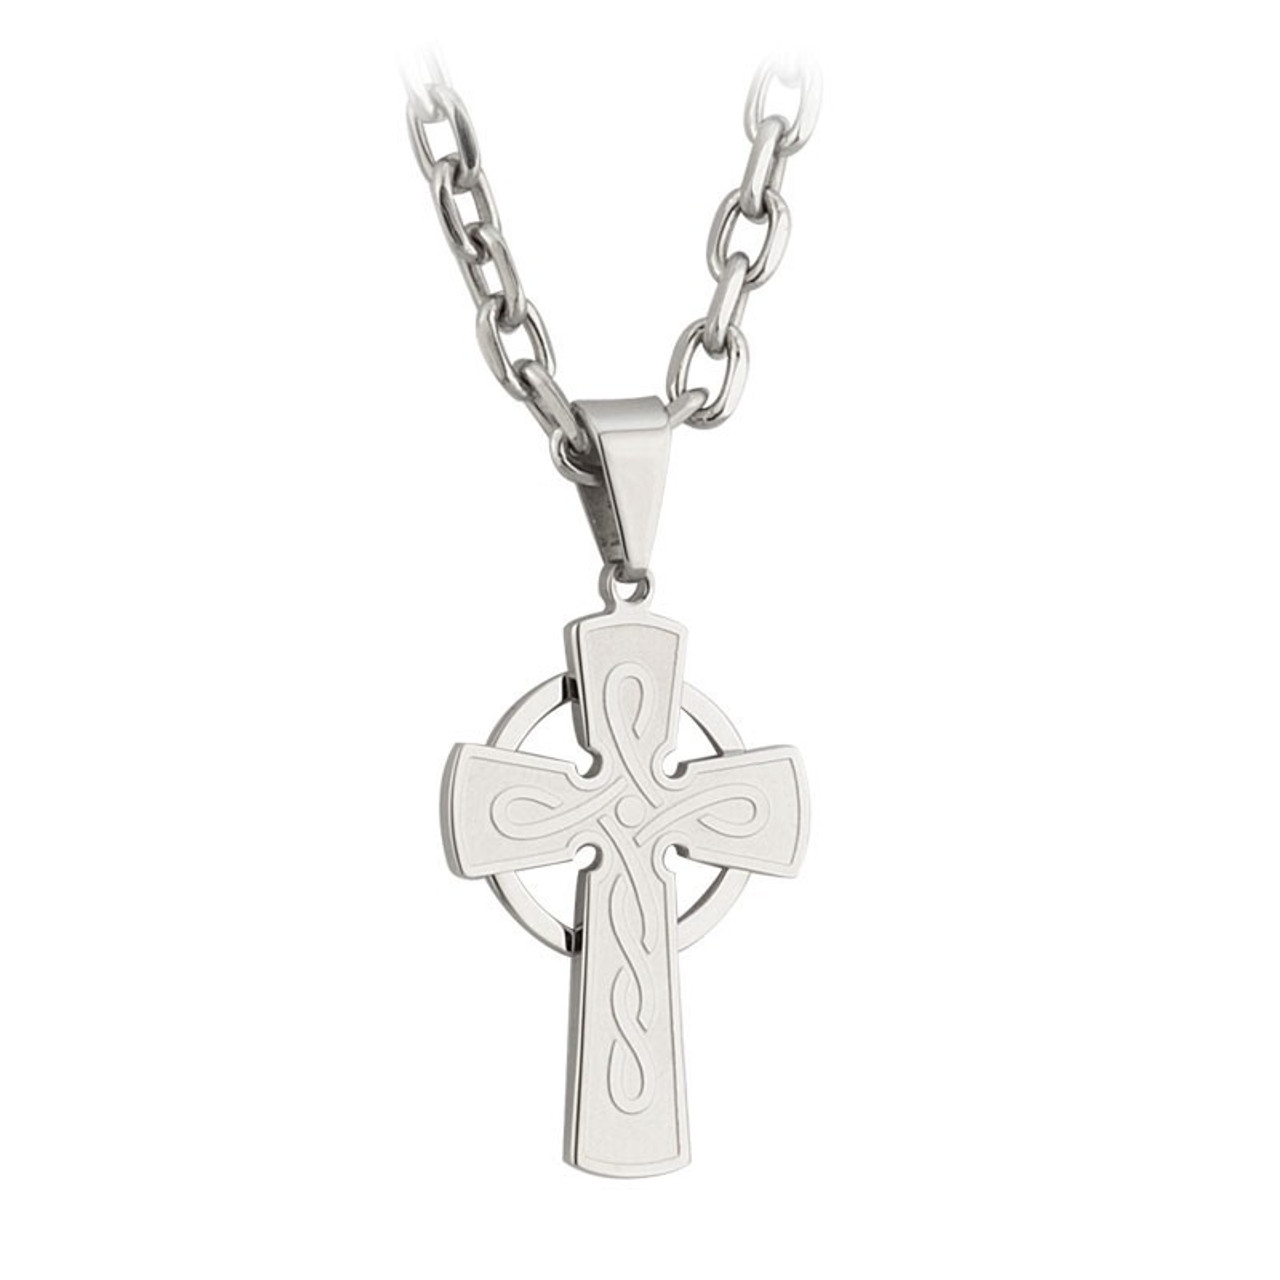 Stainless Steel Celtic Cross Pendant, 18 Inch Chain